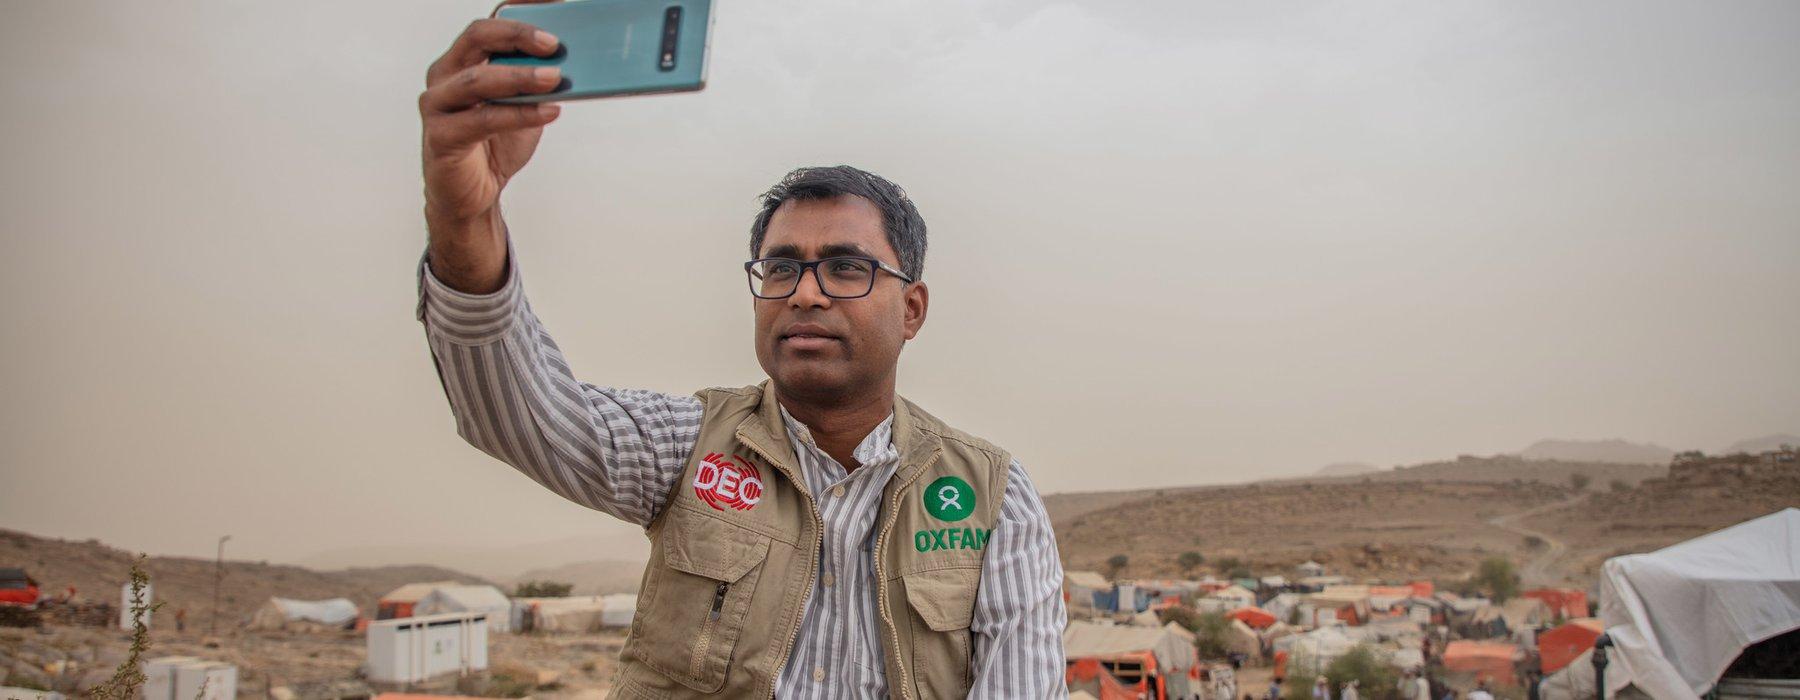 Danny Sriskandarajah visiting Houth, IDP camp, Yemen